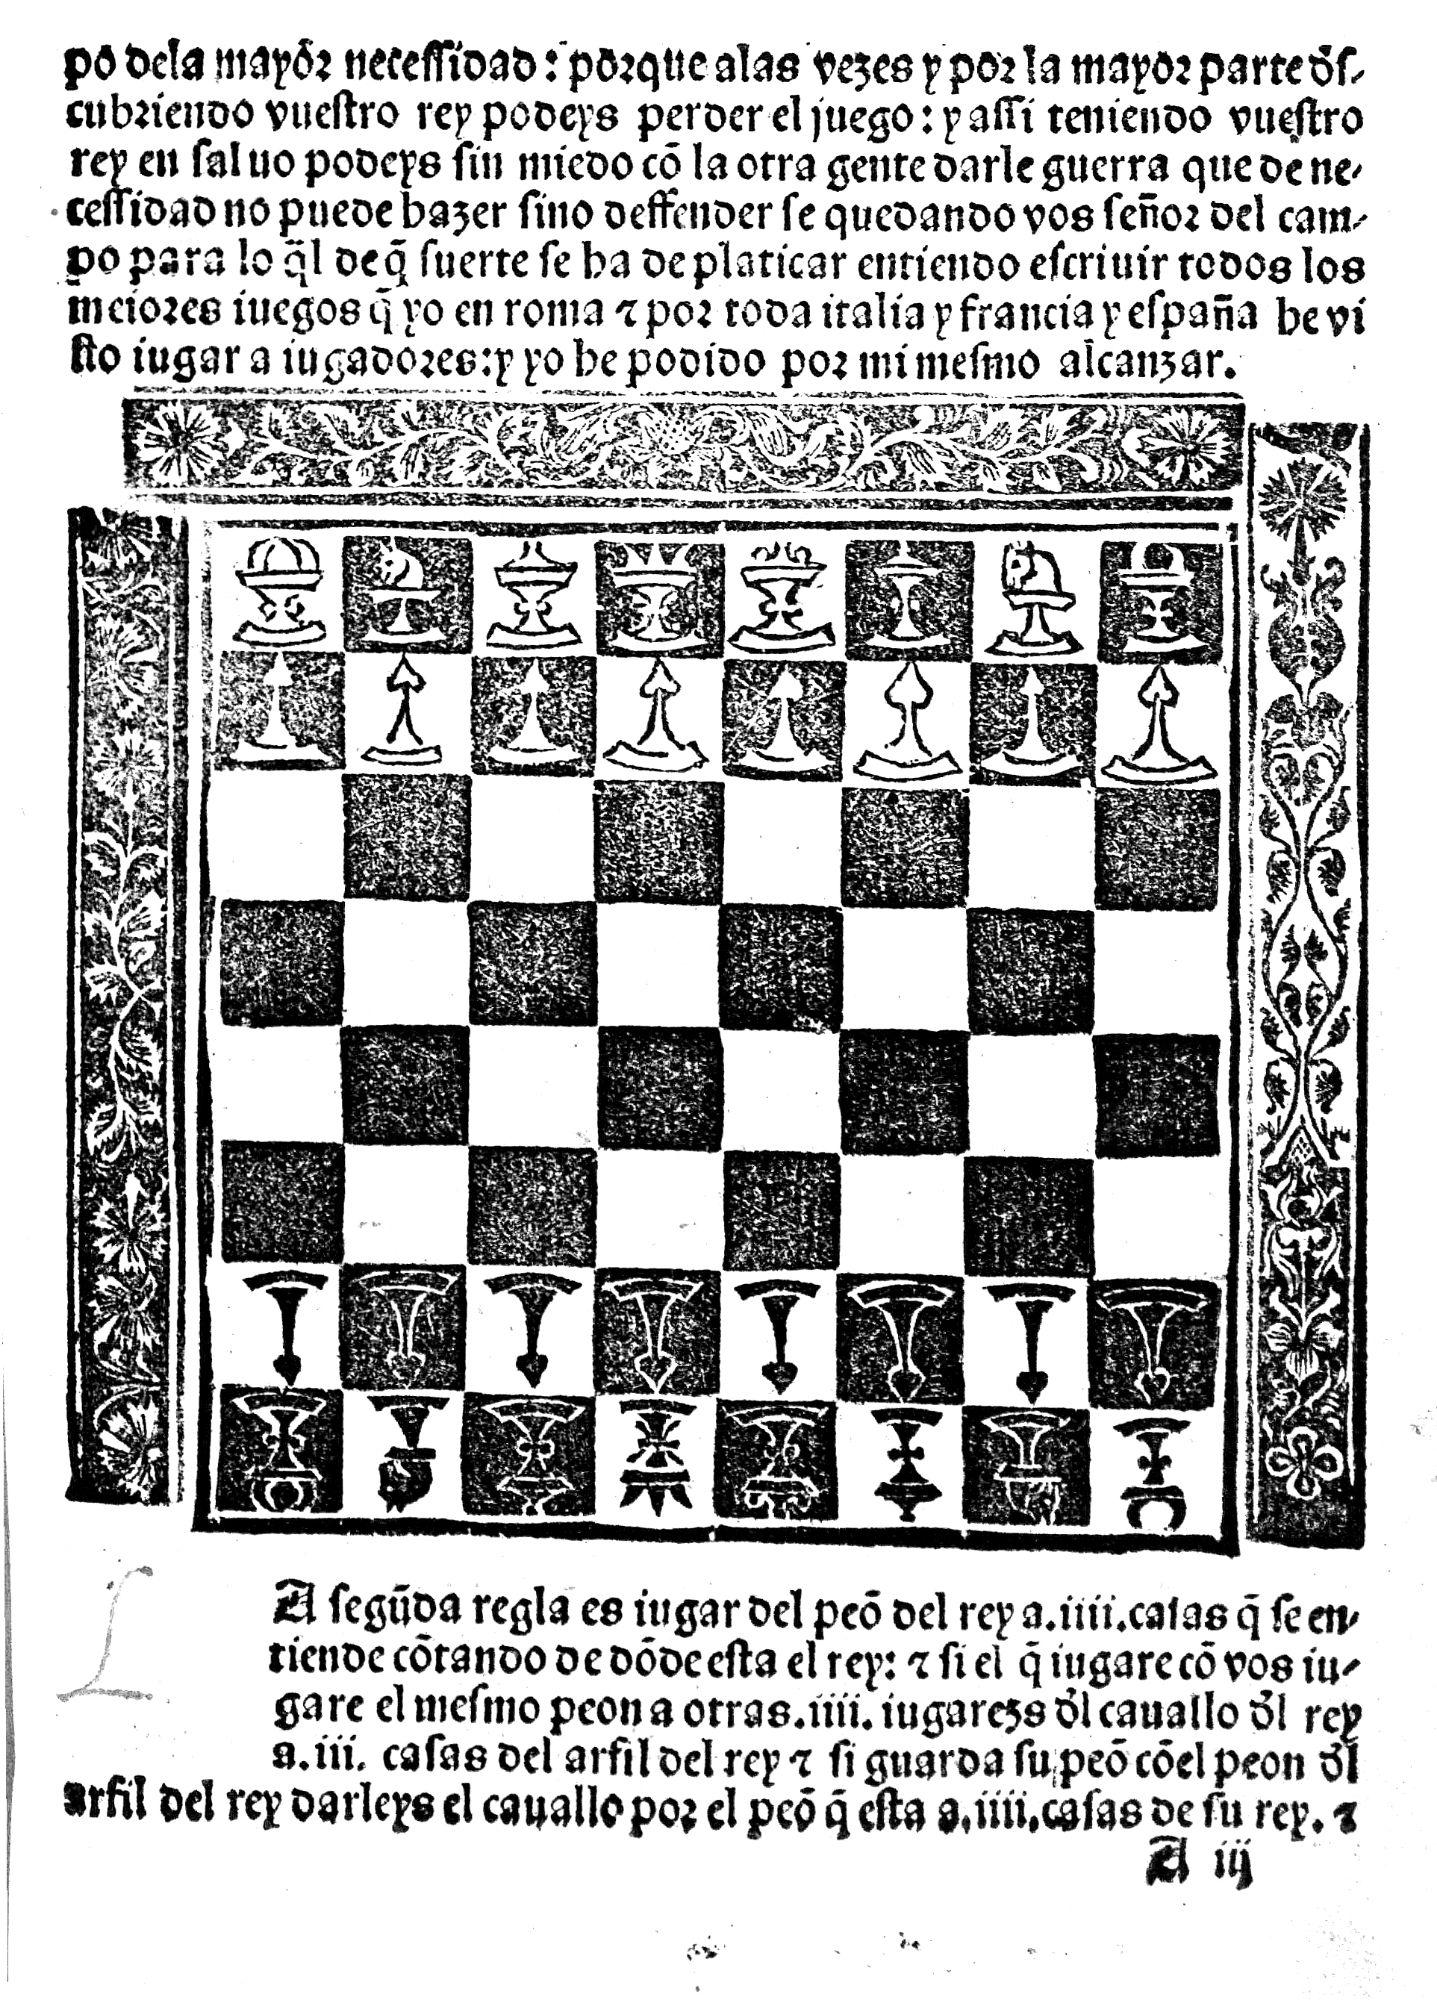 The chess set of Luis Ramerez de Lucena